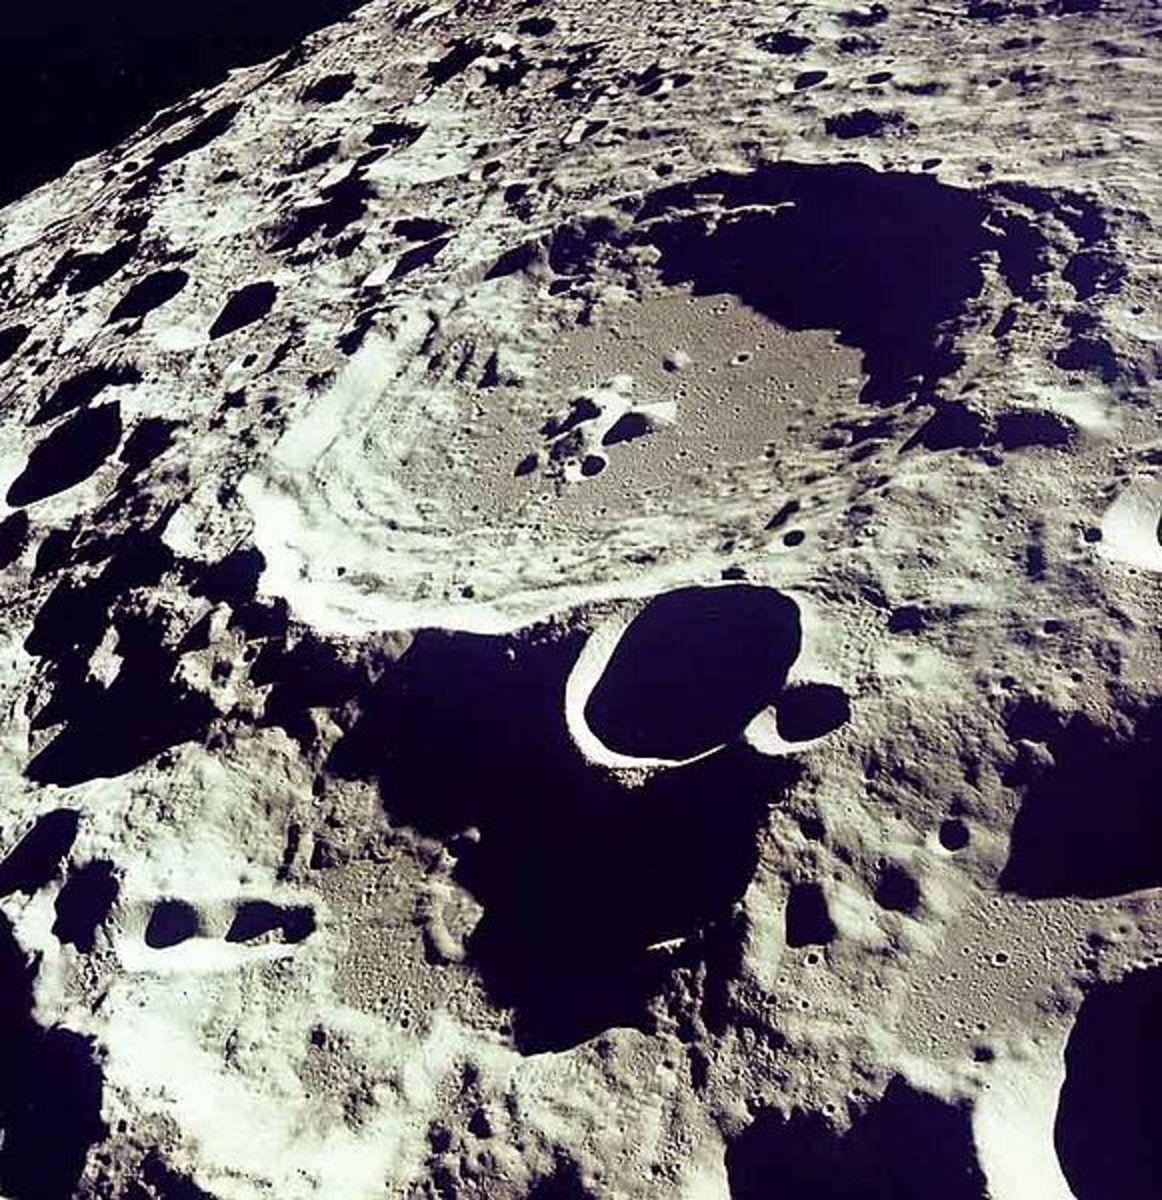 Dedal crater